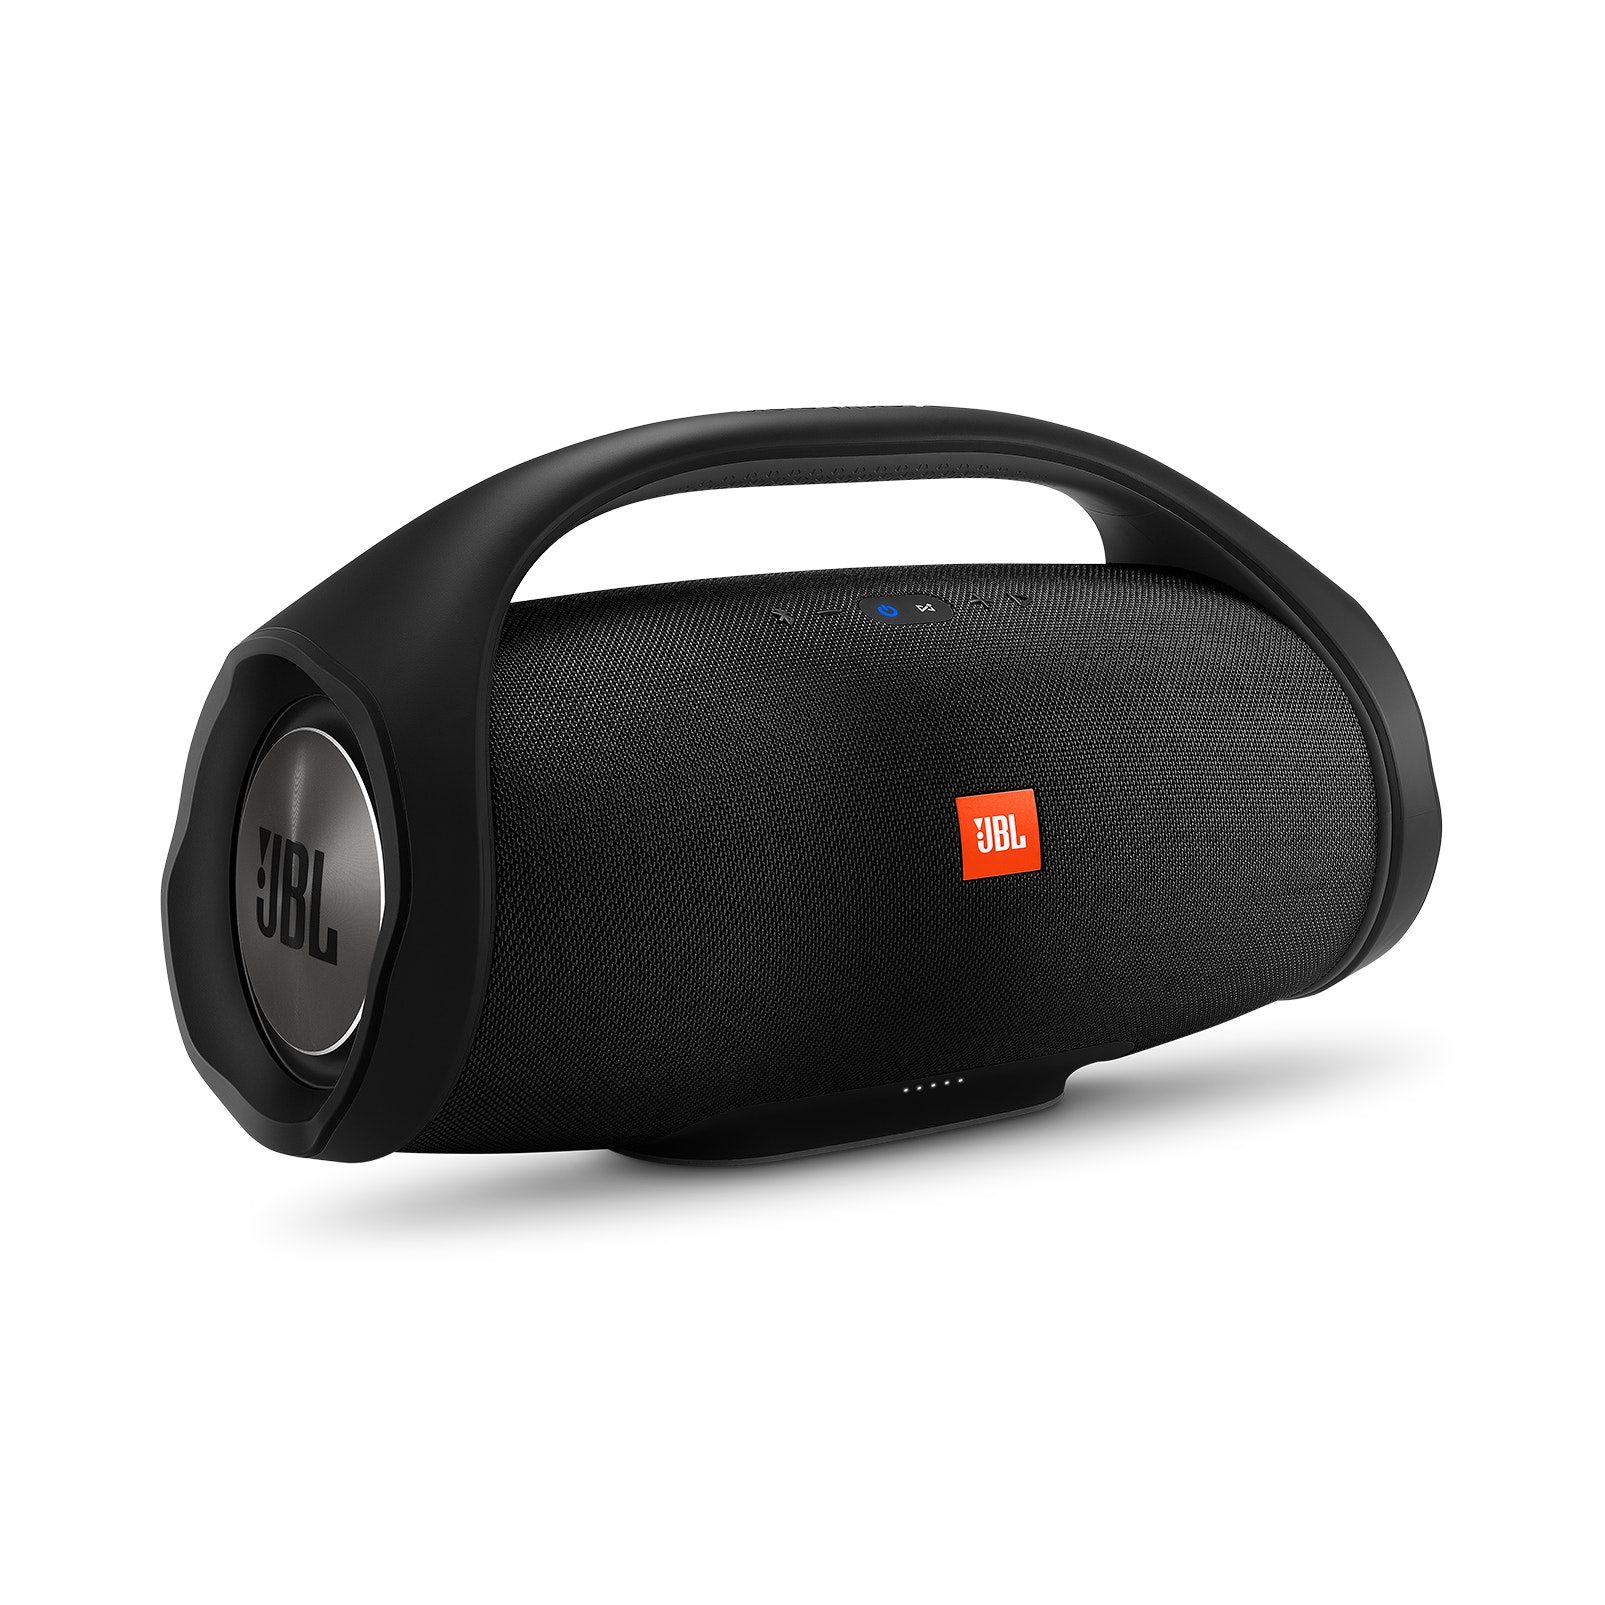 JBL Boombox | Portable Bluetooth Speaker